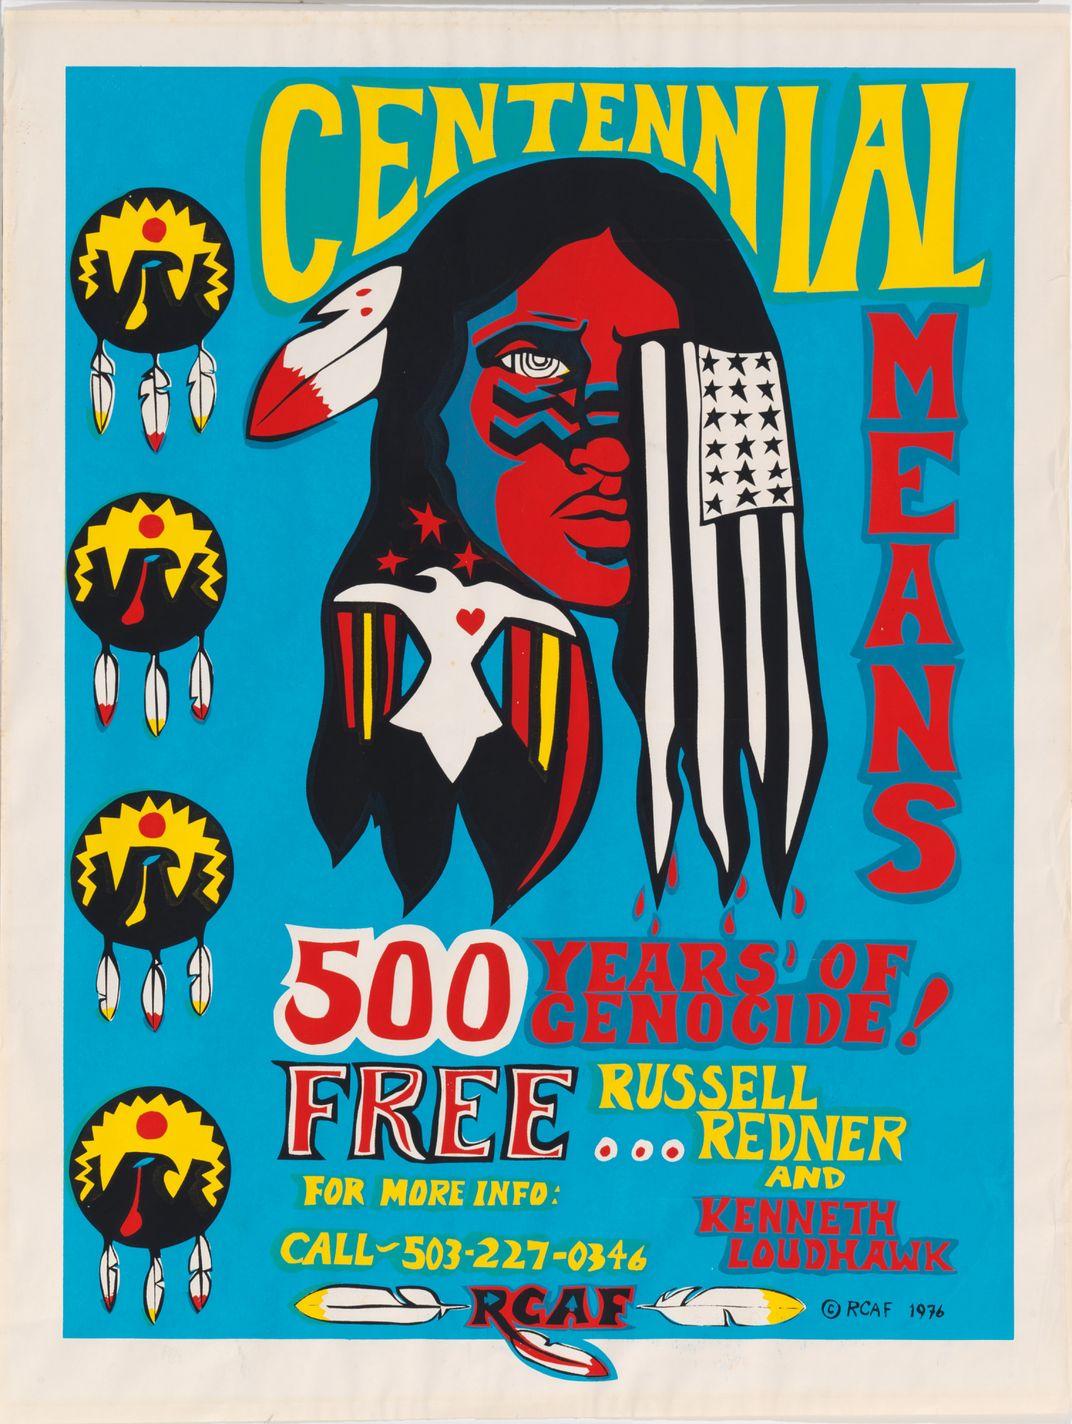 A blue print with a Native American figure and a U.S. flag